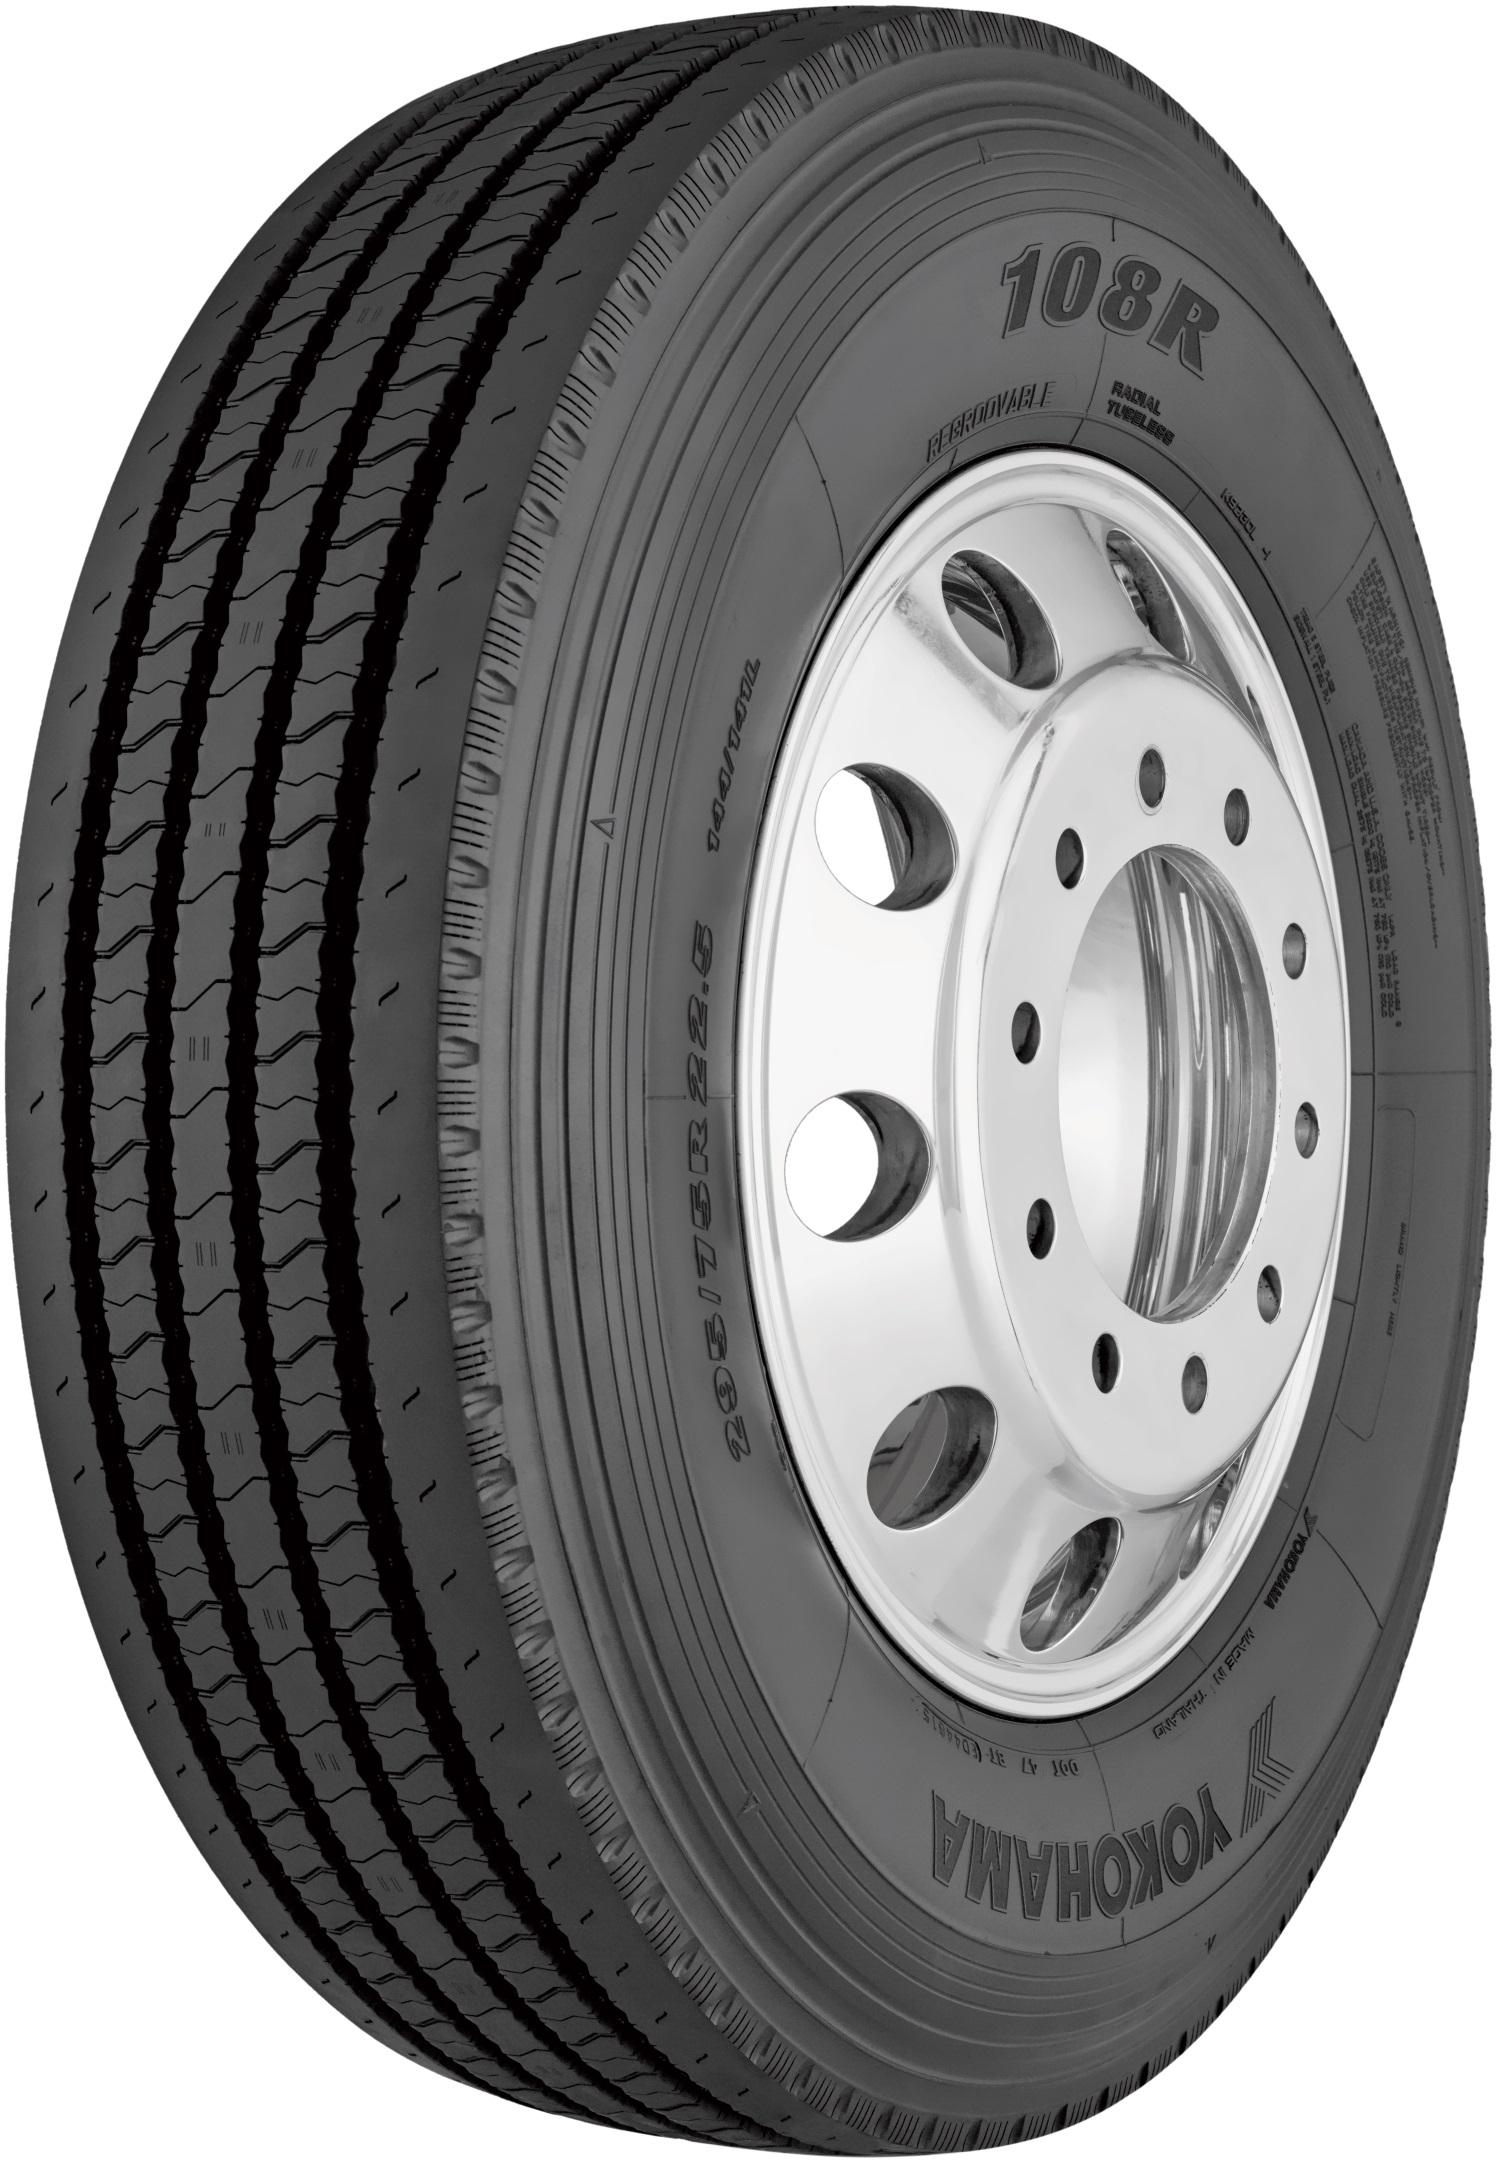 Yokohama Unveils a Regional All-Position Steer Tire